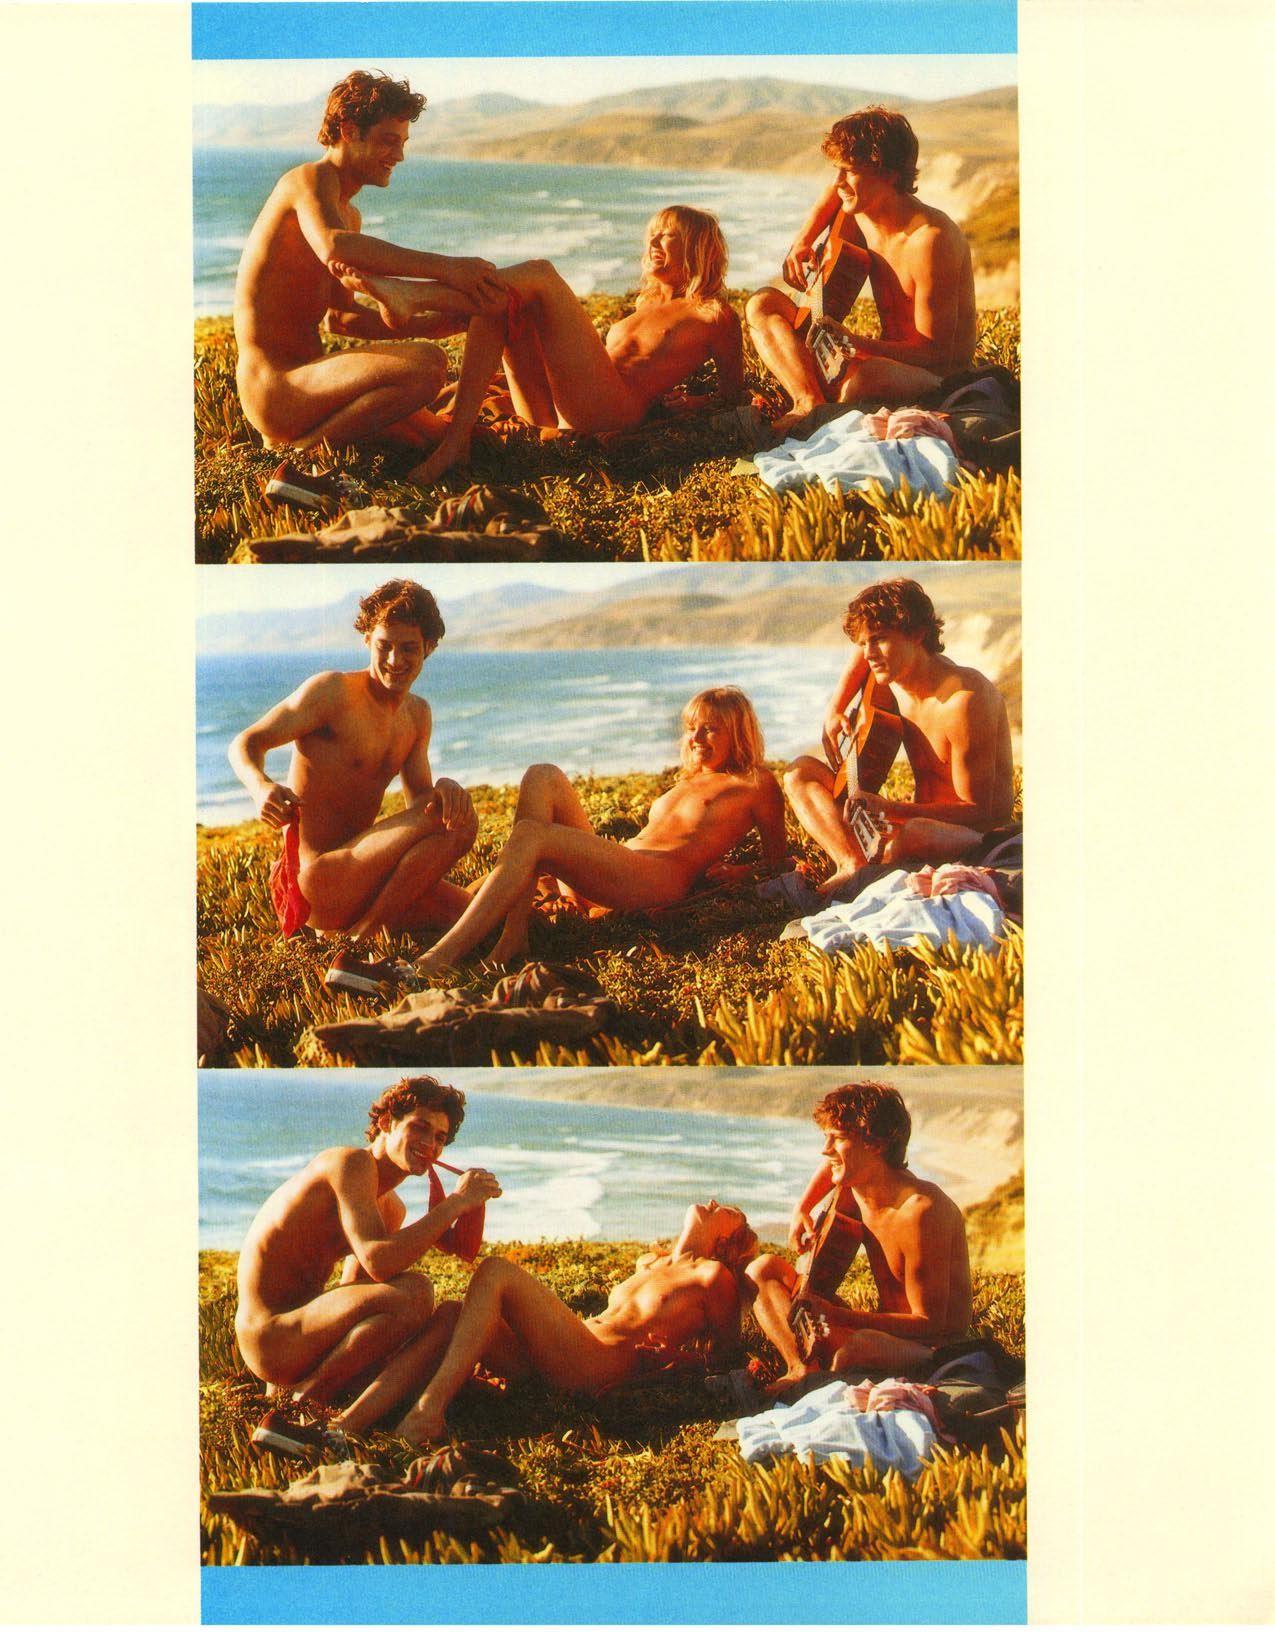 Malin Akerman sexo en público